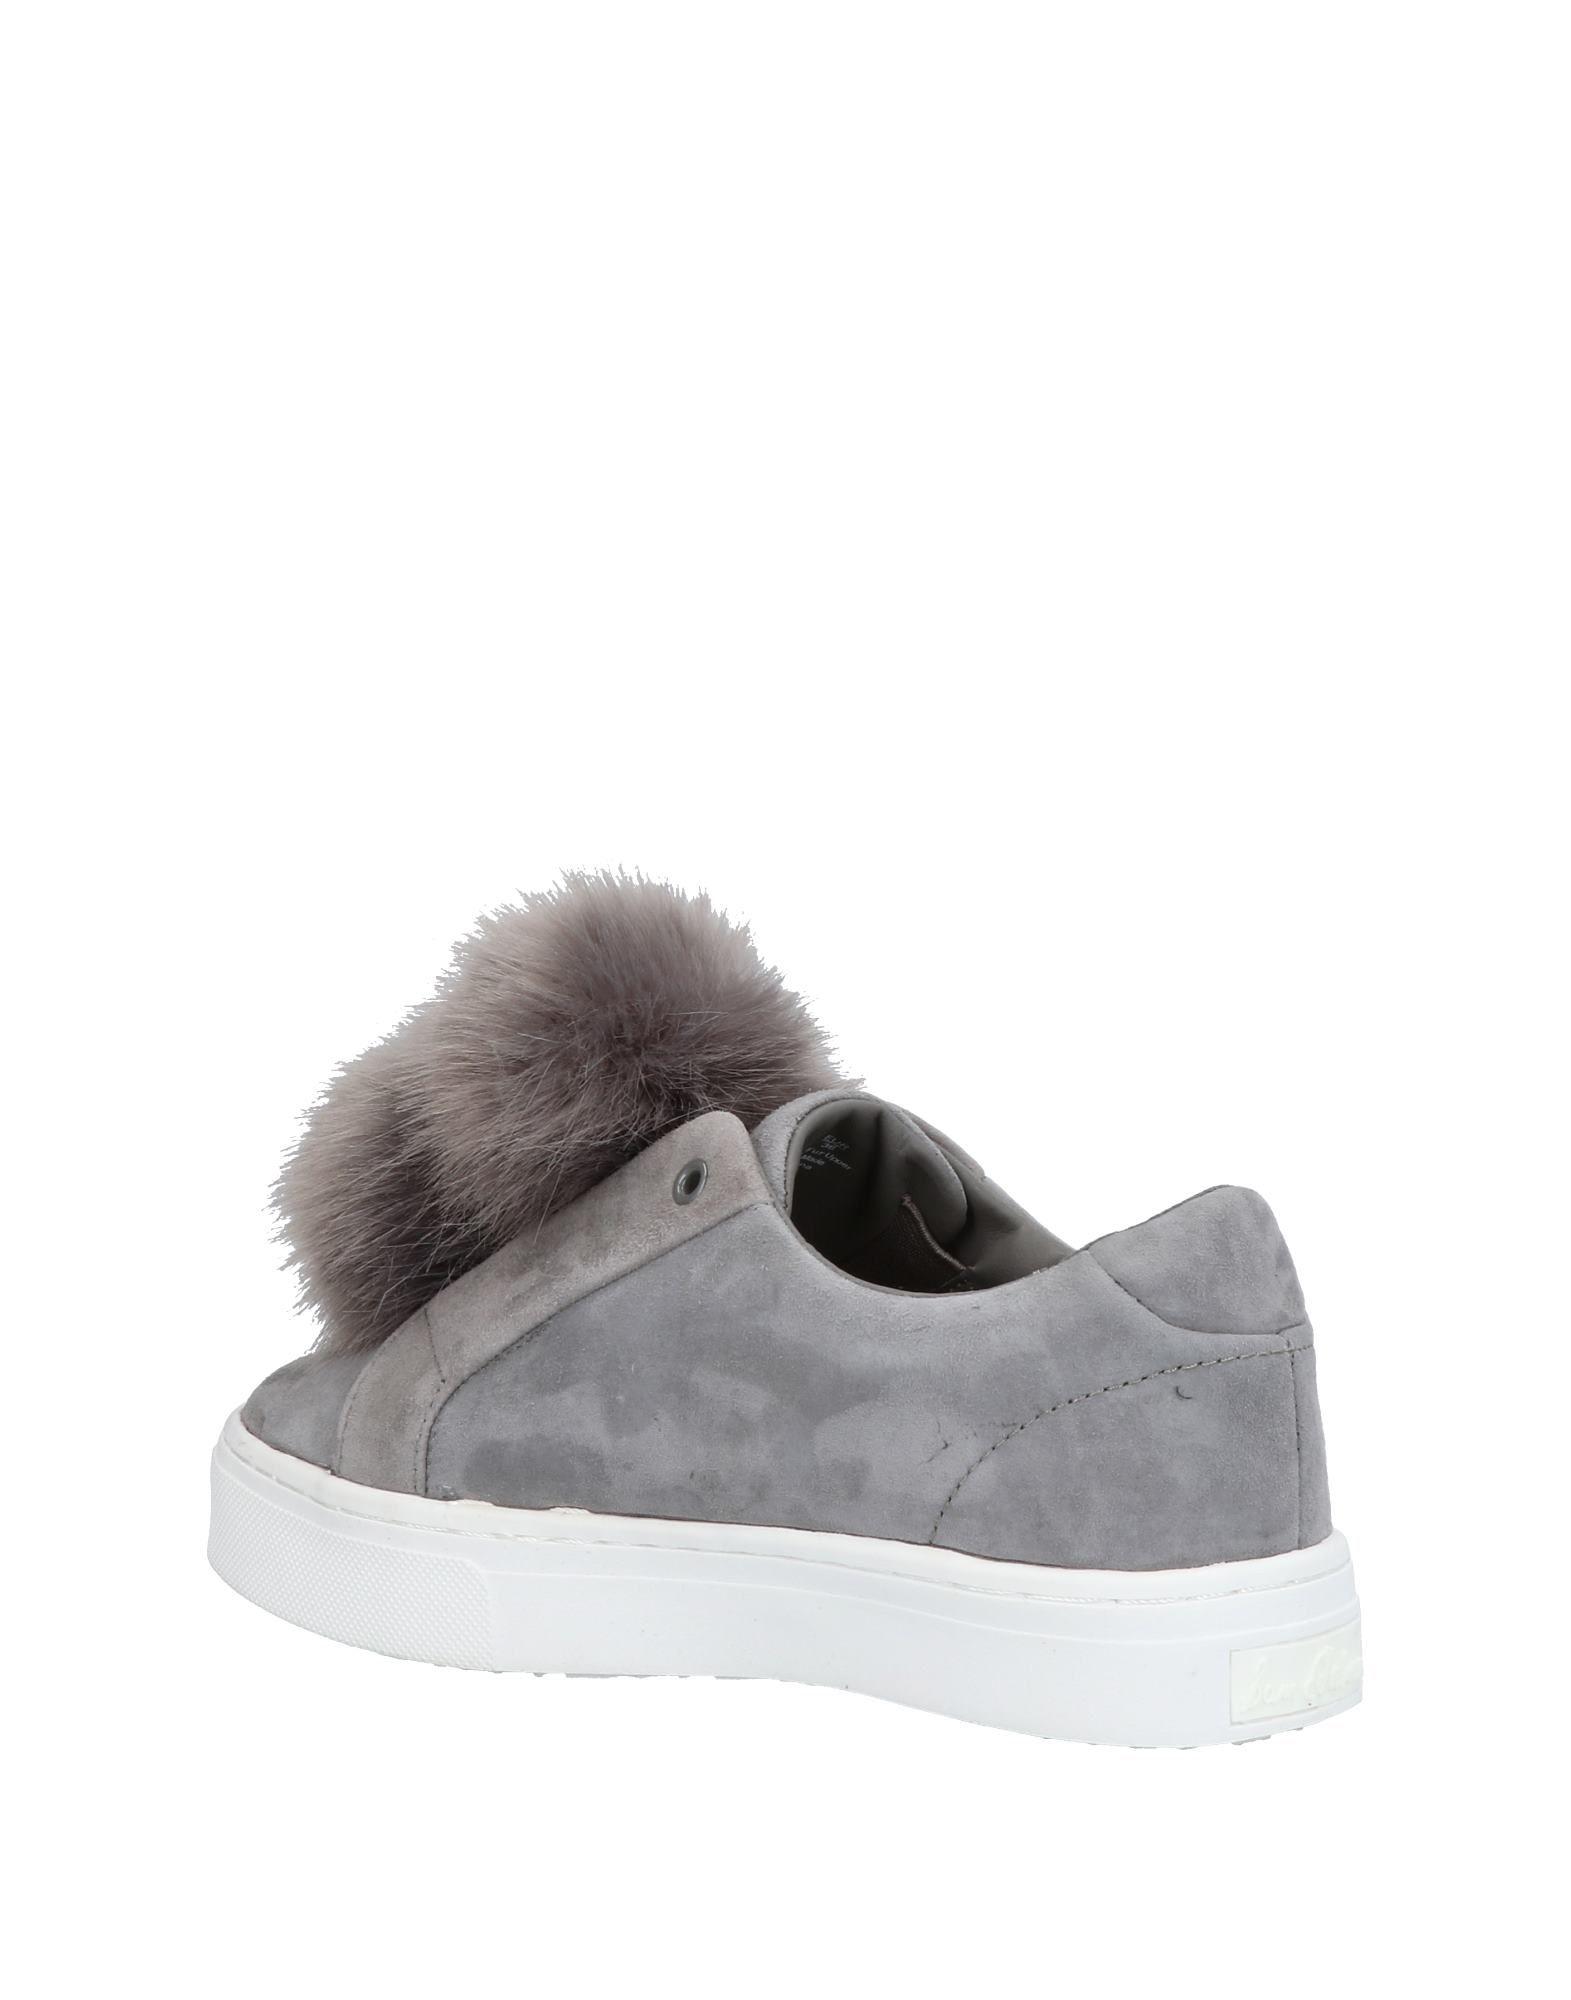 Sam Edelman Sneakers - - - Women Sam Edelman Sneakers online on  United Kingdom - 11425048DD f00b48